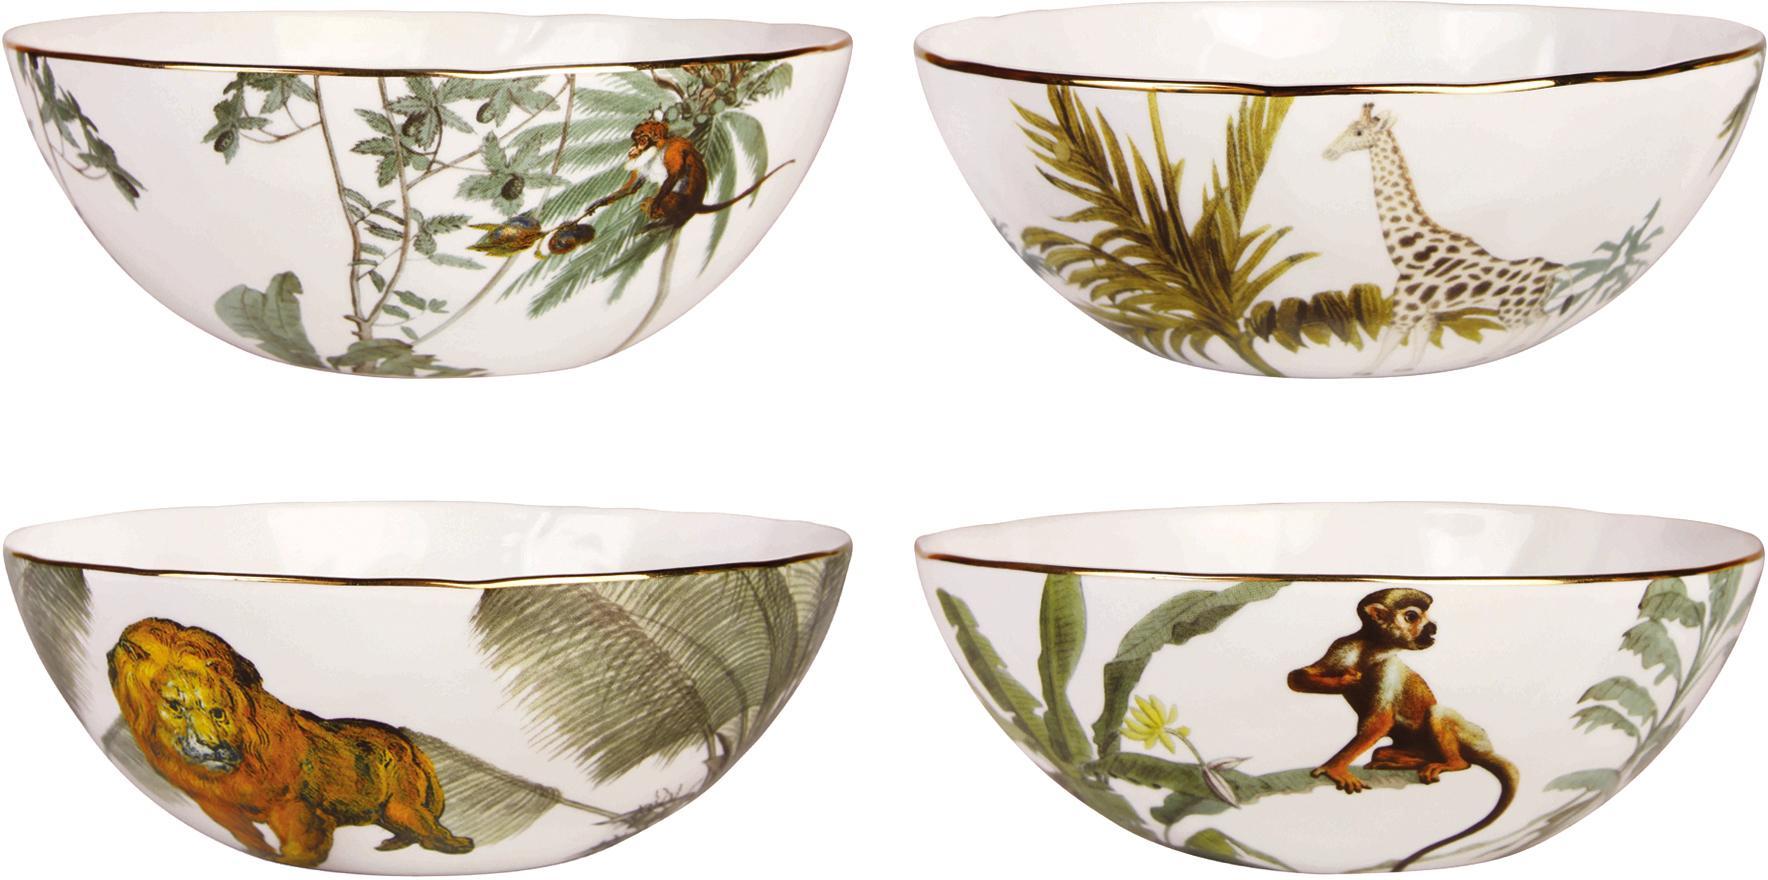 Boles Animaux, 4uds., Porcelana, Multicolor, Ø 16 x Al 5 cm